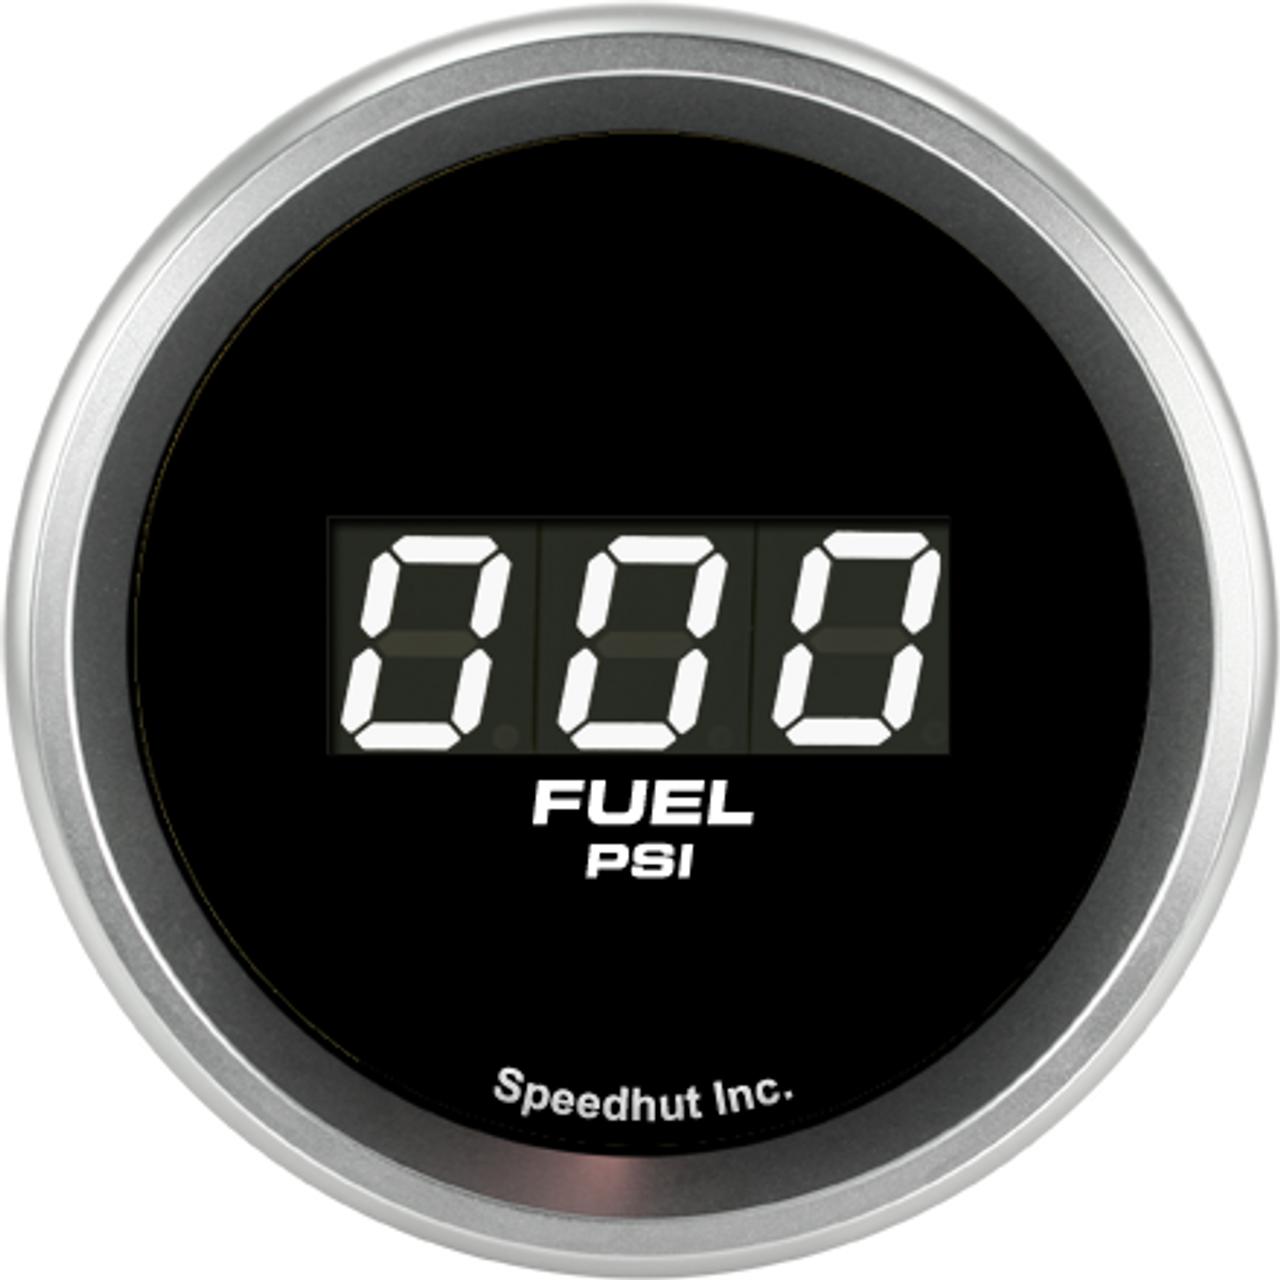 "2-1/16"" Fuel Pressure Digital Gauge 0-100psi"